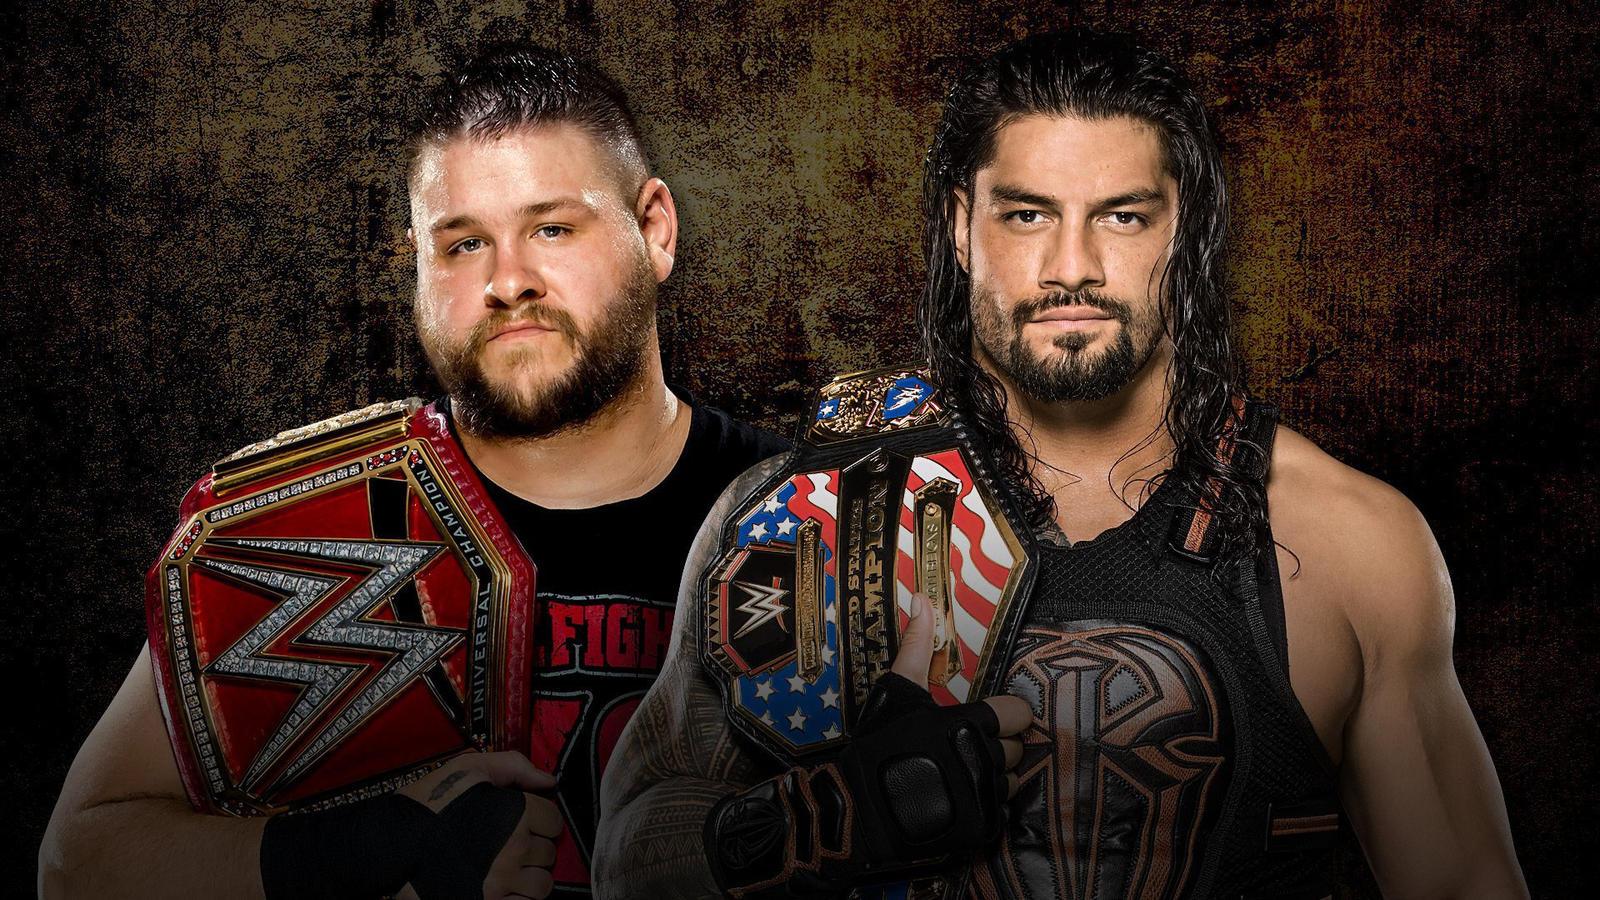 Roman Reigns pode derrotar Kevin Owens no WWE Roadblock